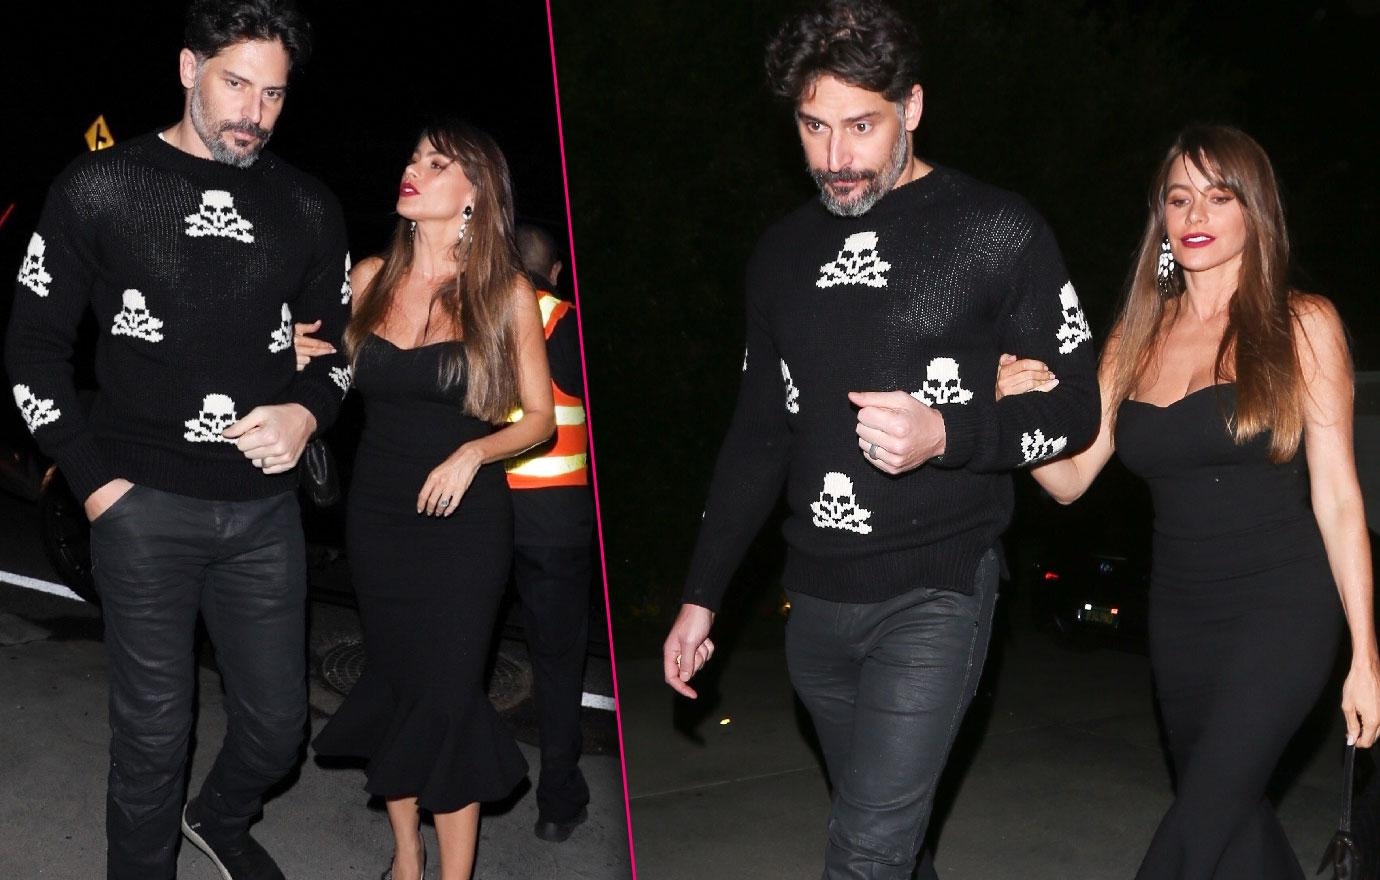 Sofia Vergara and Joe Manganiello Hit Up Christmas Party